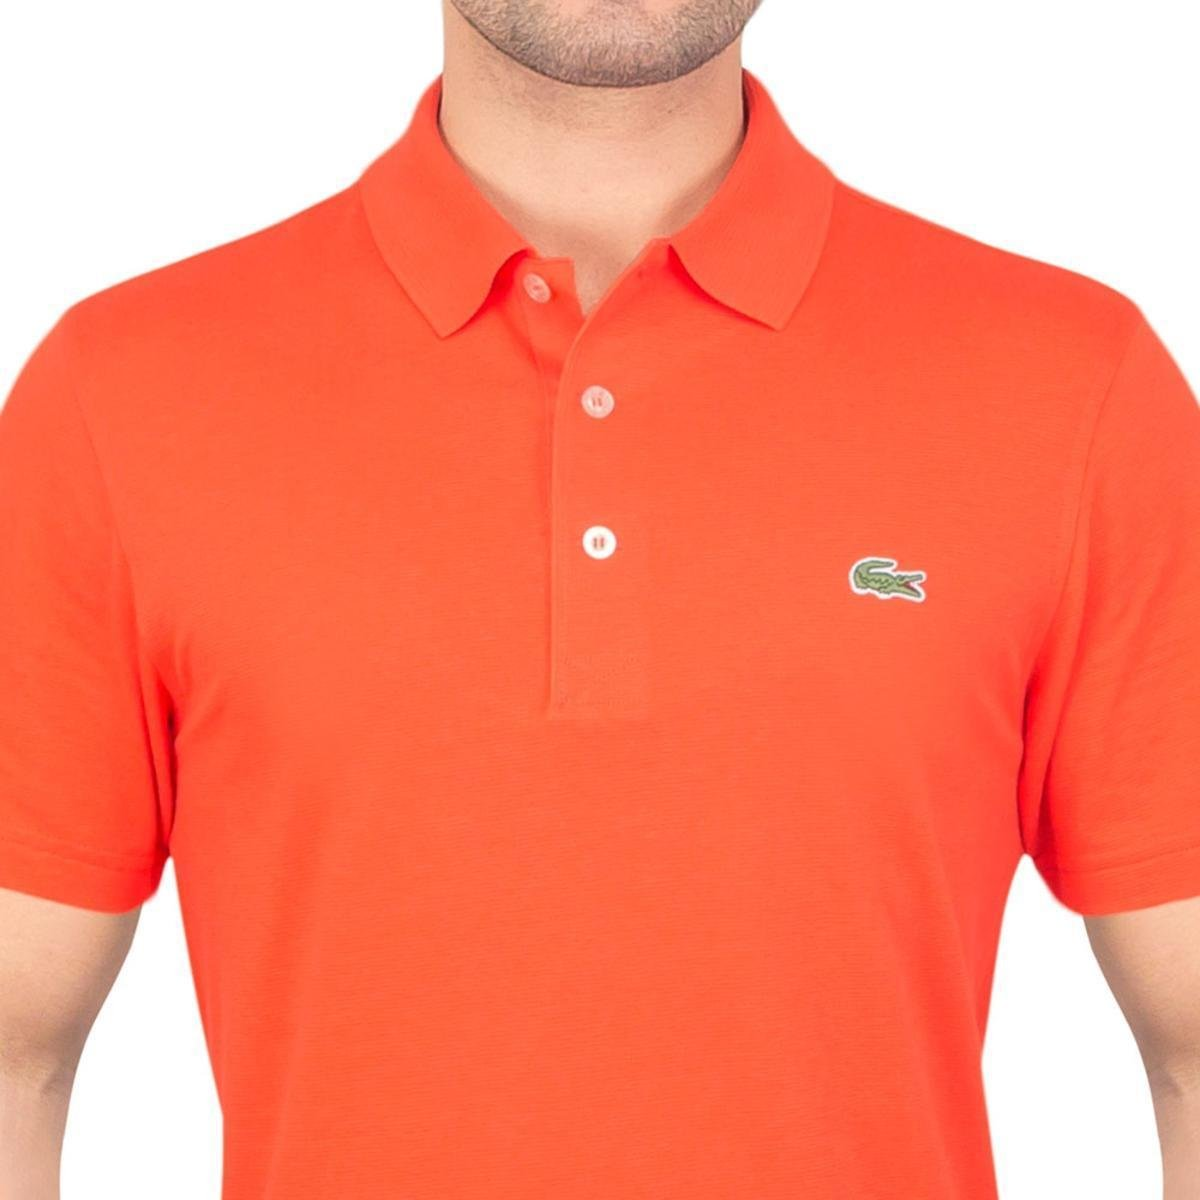 Camisa Polo Lacoste Super Light Masculina - Laranja e Branco ... 7021819659